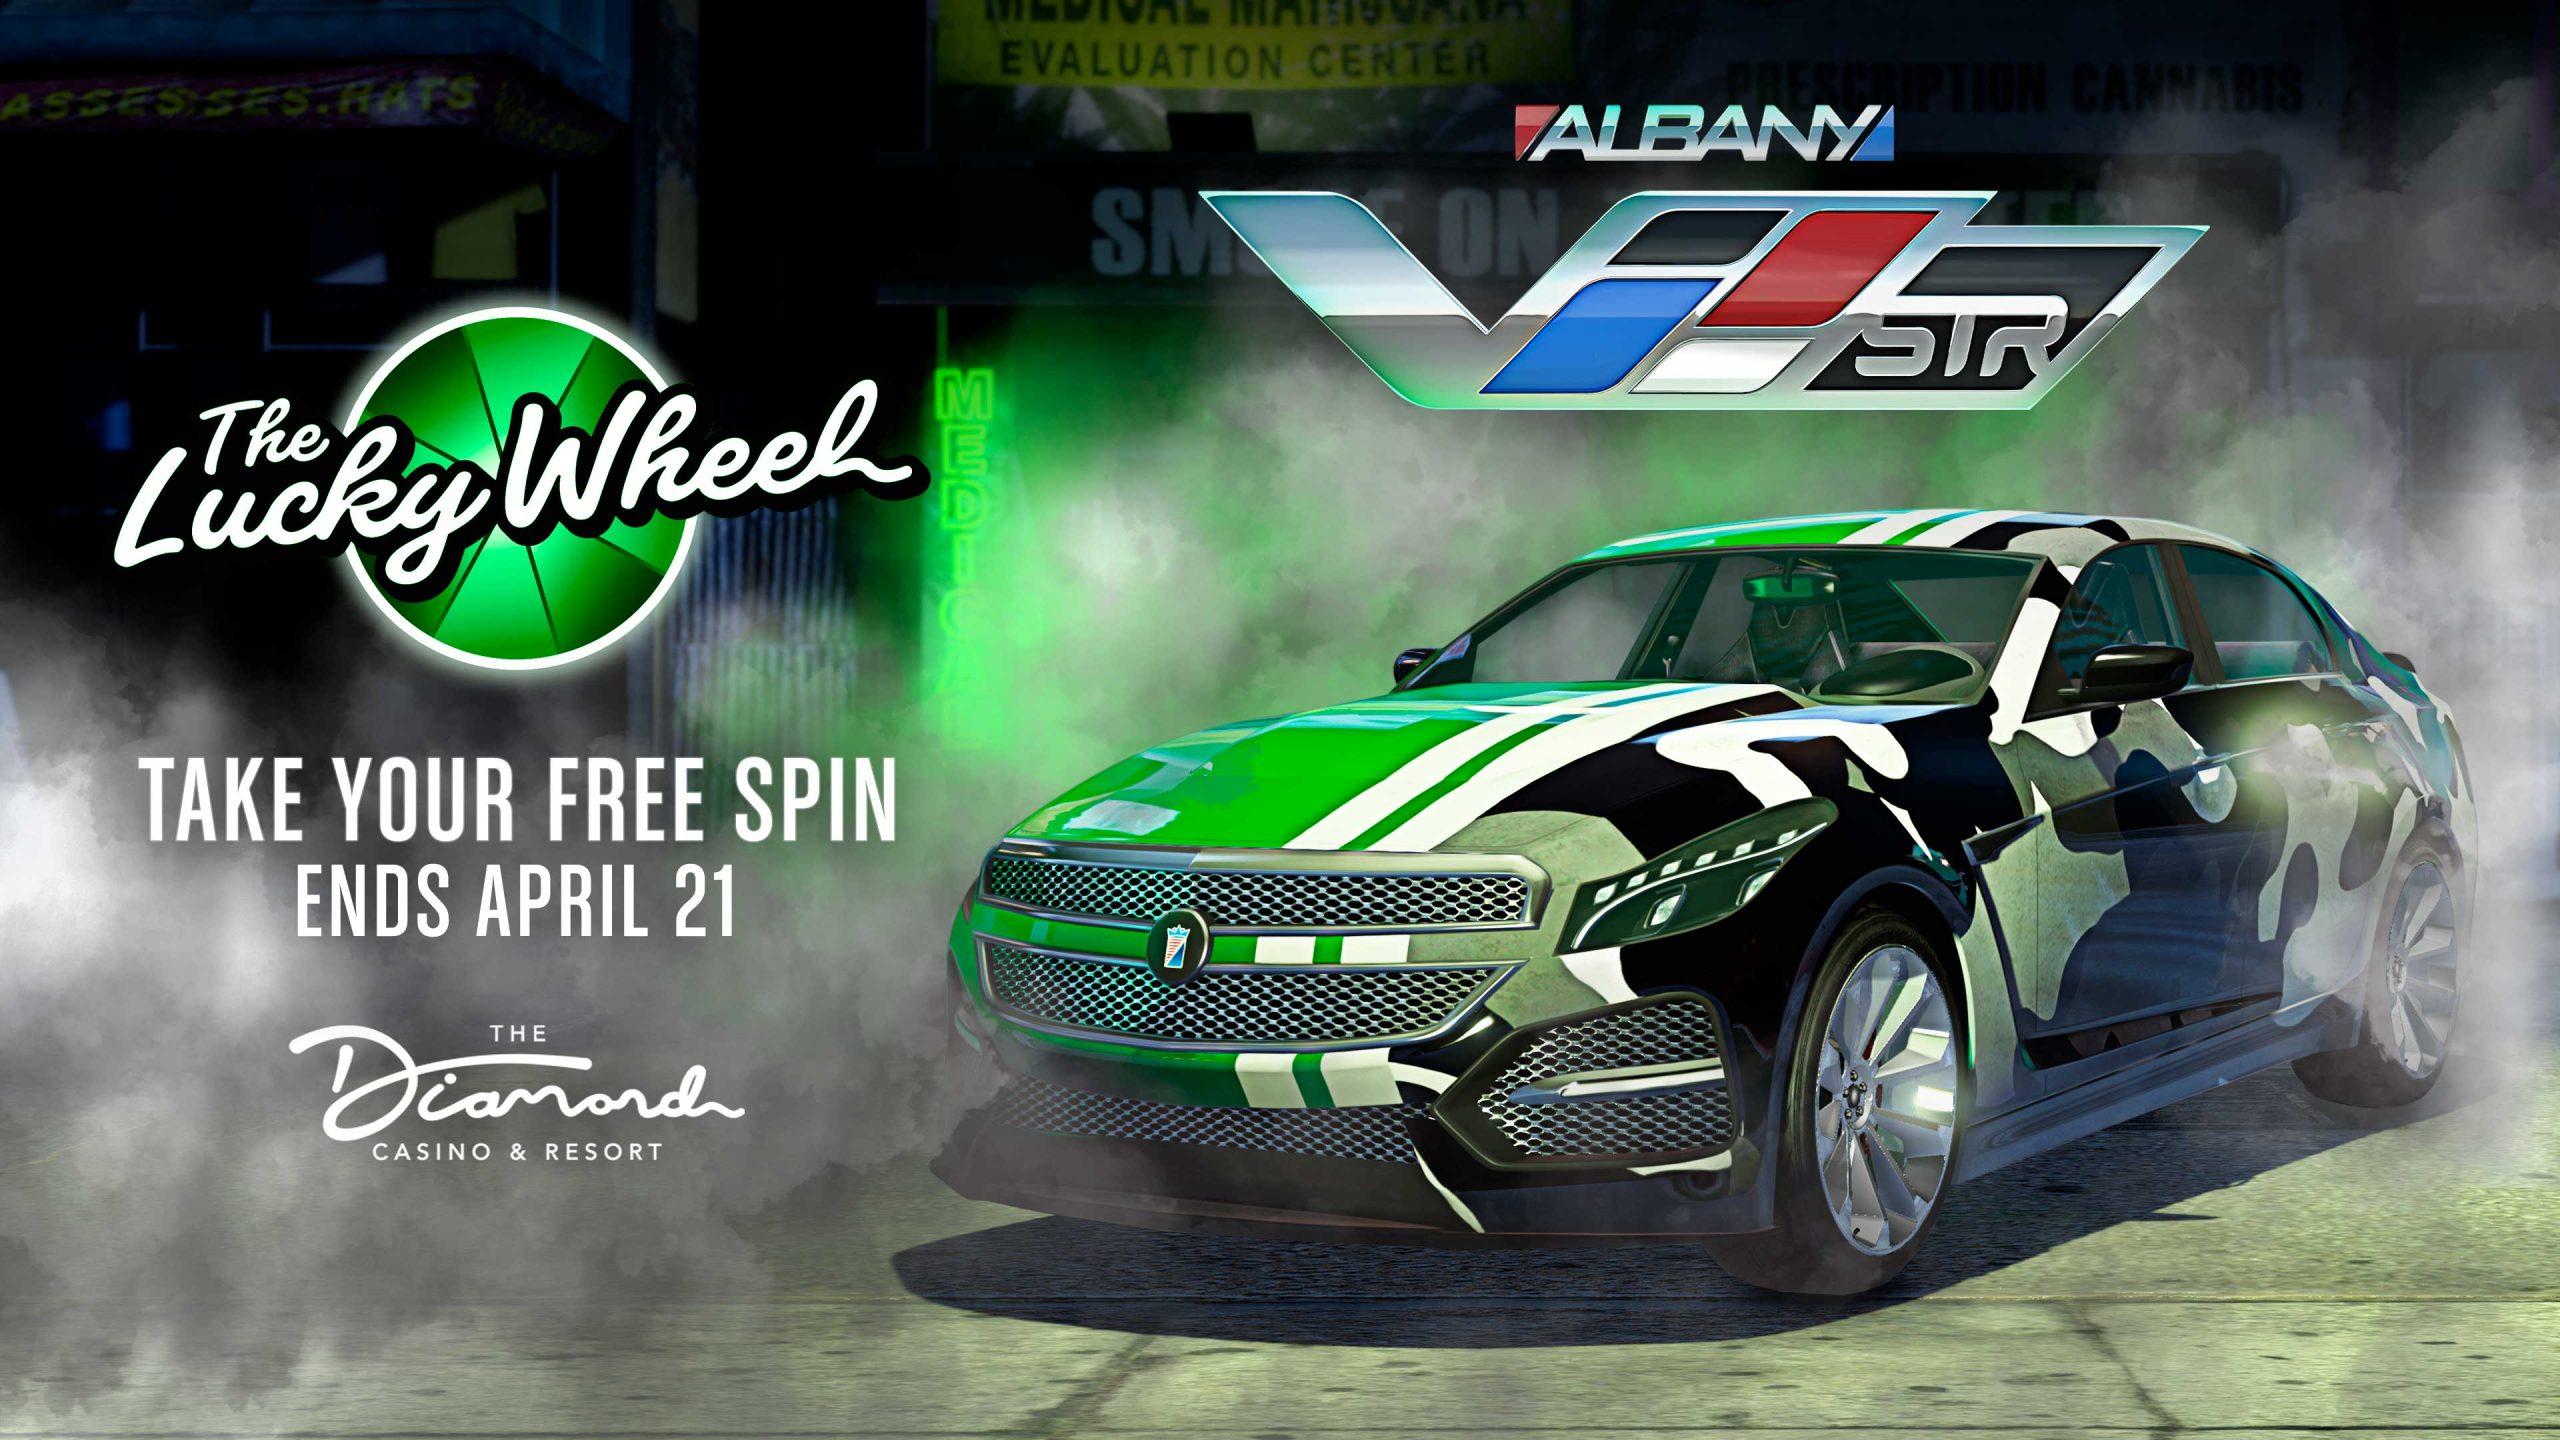 Albany V STR Lucky wheel